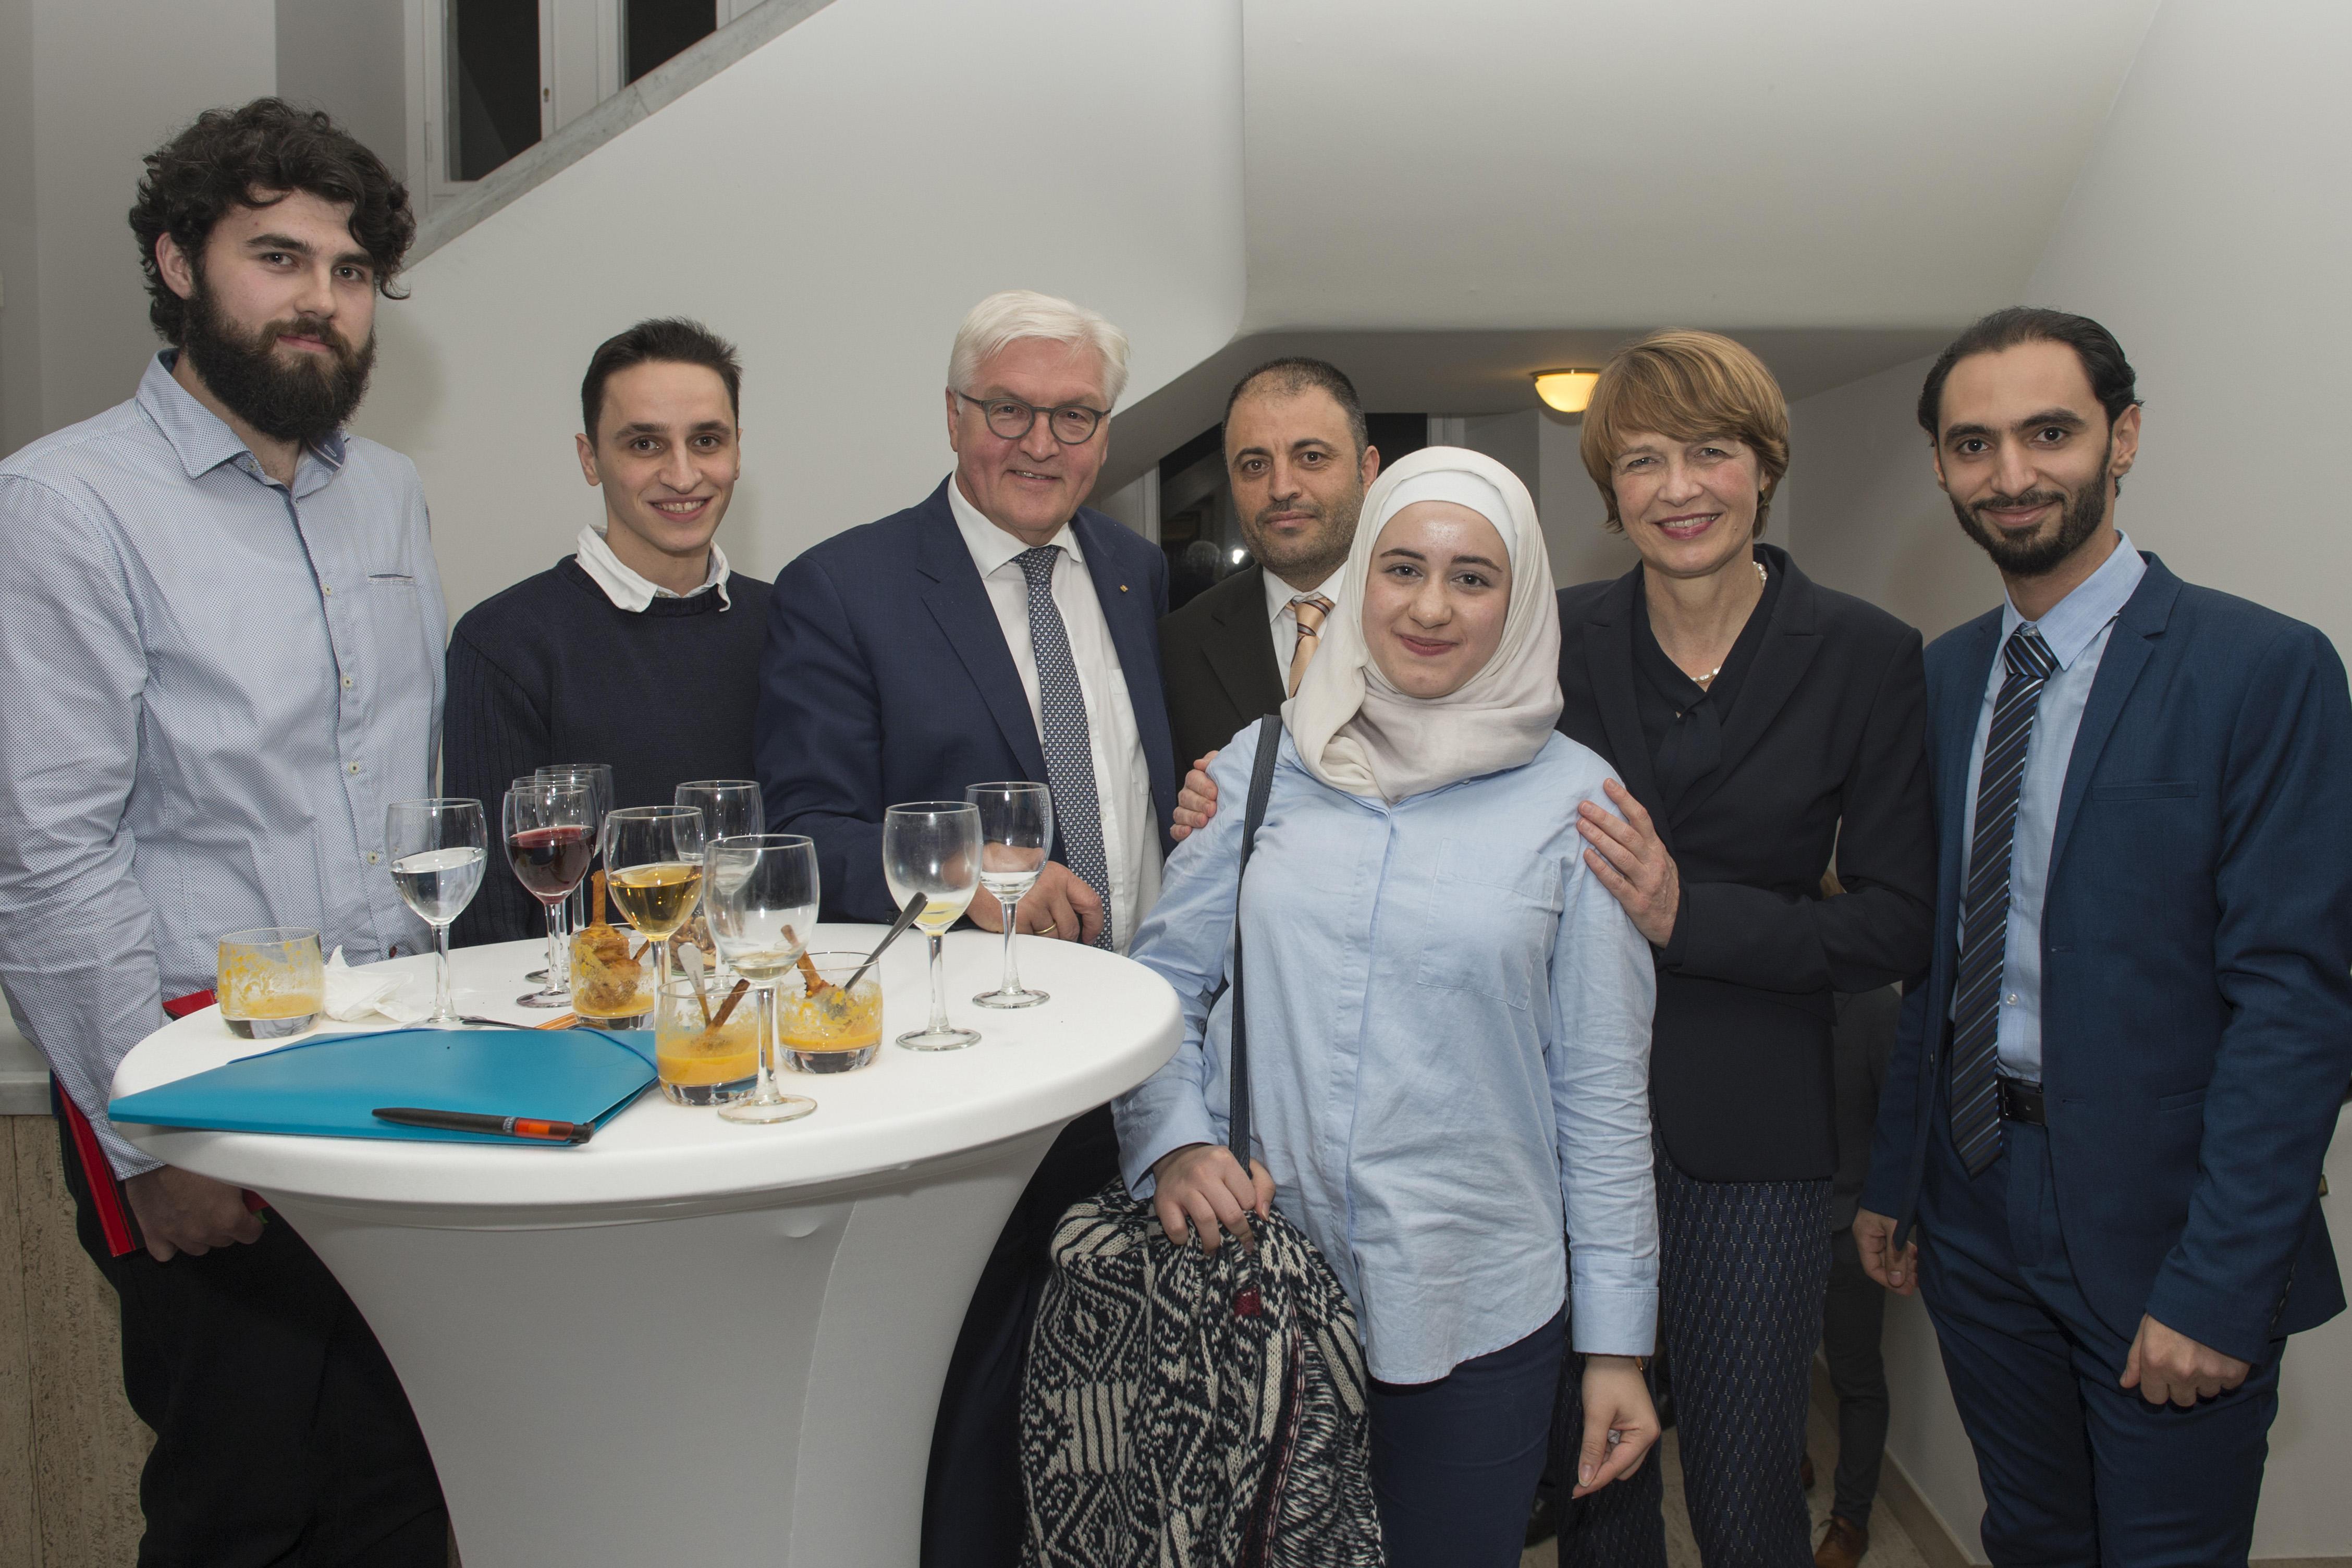 Gute Gesprächsatmosphäre: (v.l.n.r.) Elmedin Sopa, Wael Amayri, Bundespräsident Steinmeier, Mohamed Ali Mohamed, Raghad Koko, Elke Büdenbender und Muhammed Al Zeen.